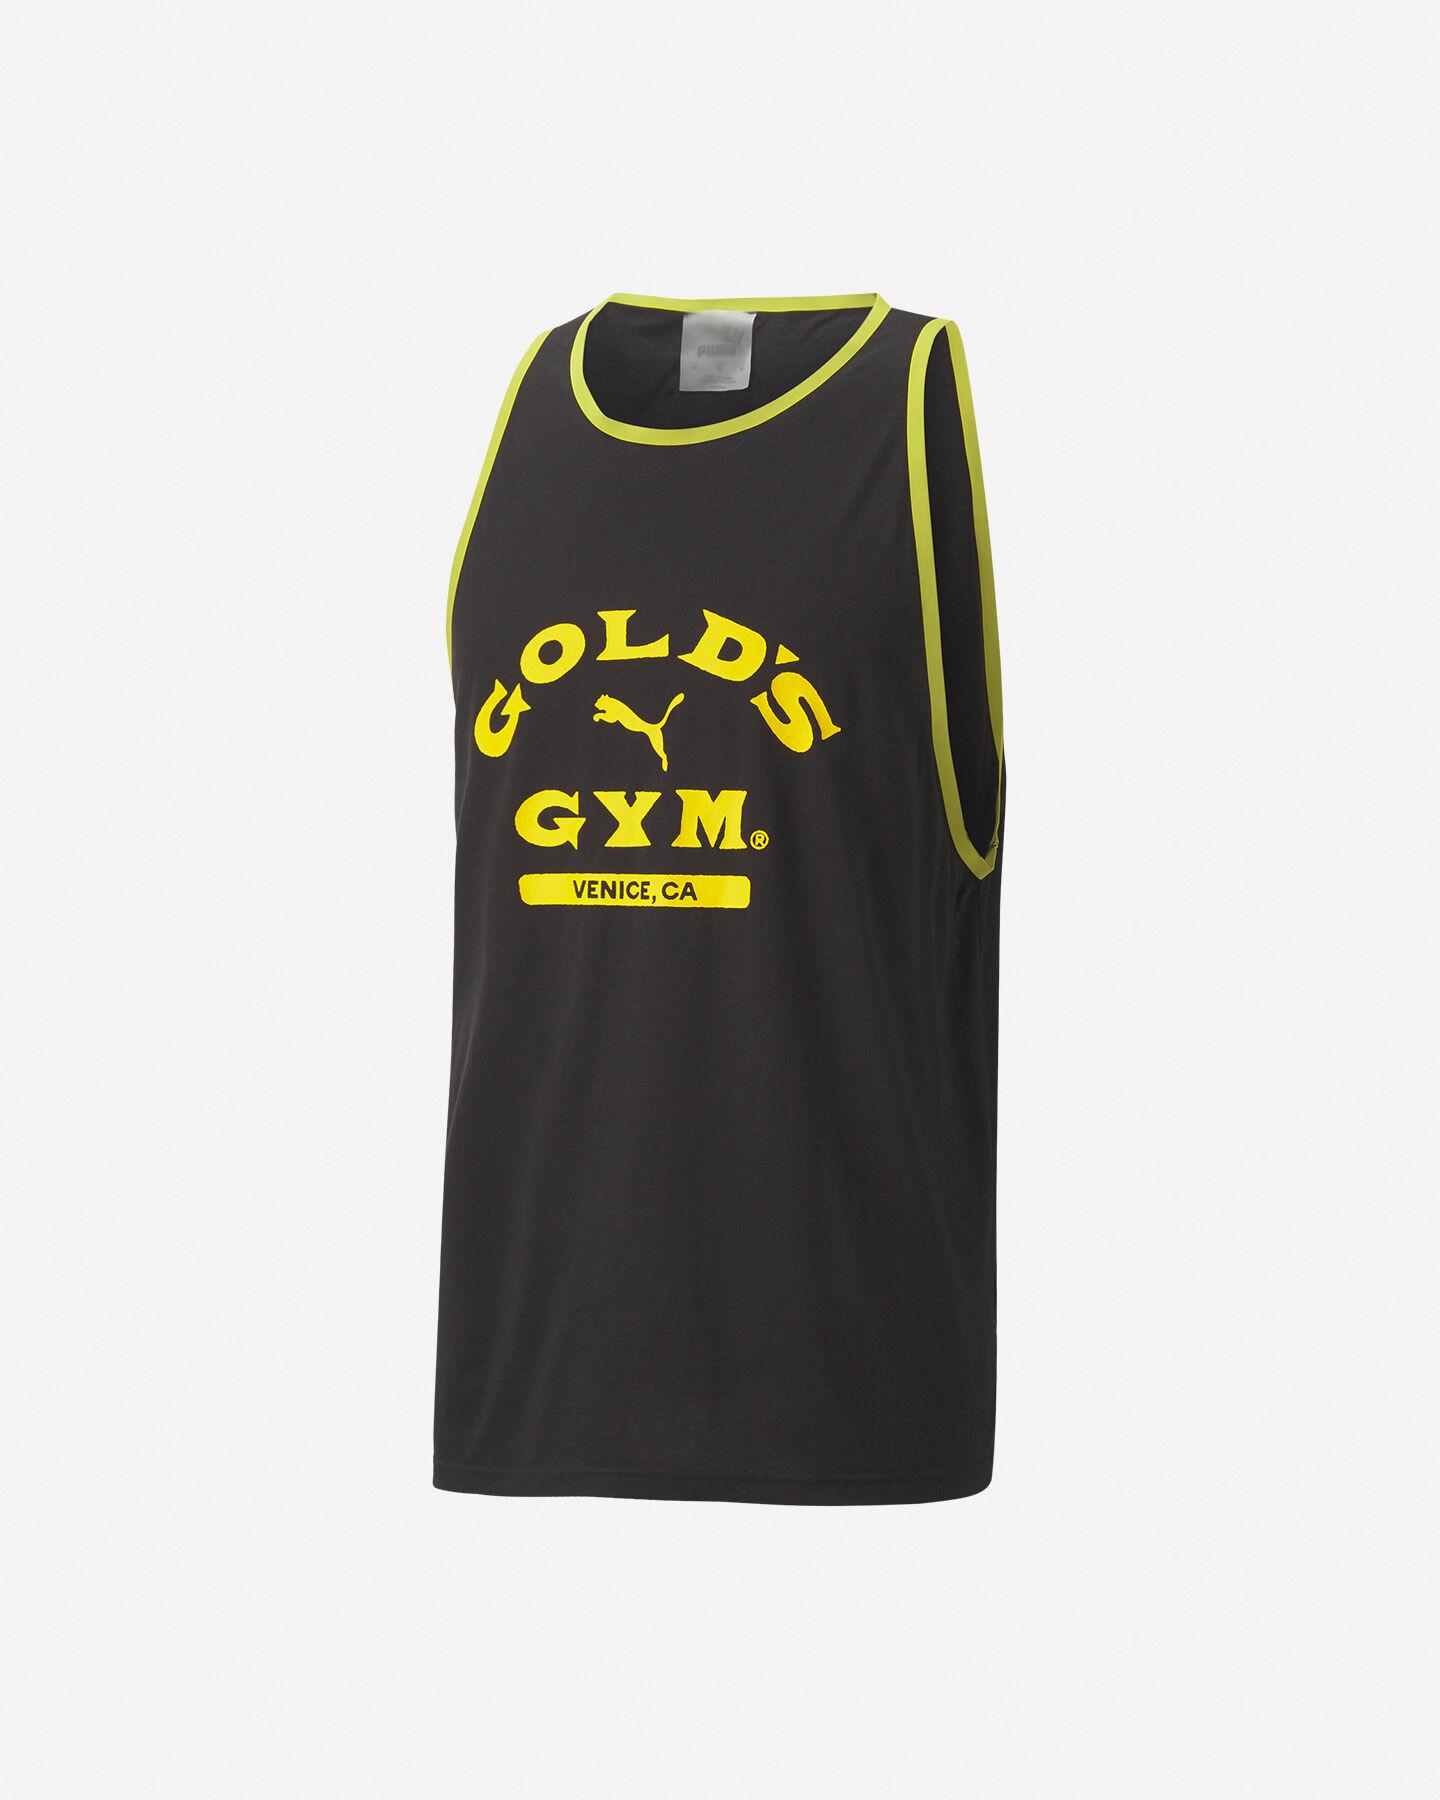 Canotta PUMA GOLD'S GYM M S5197188 scatto 0